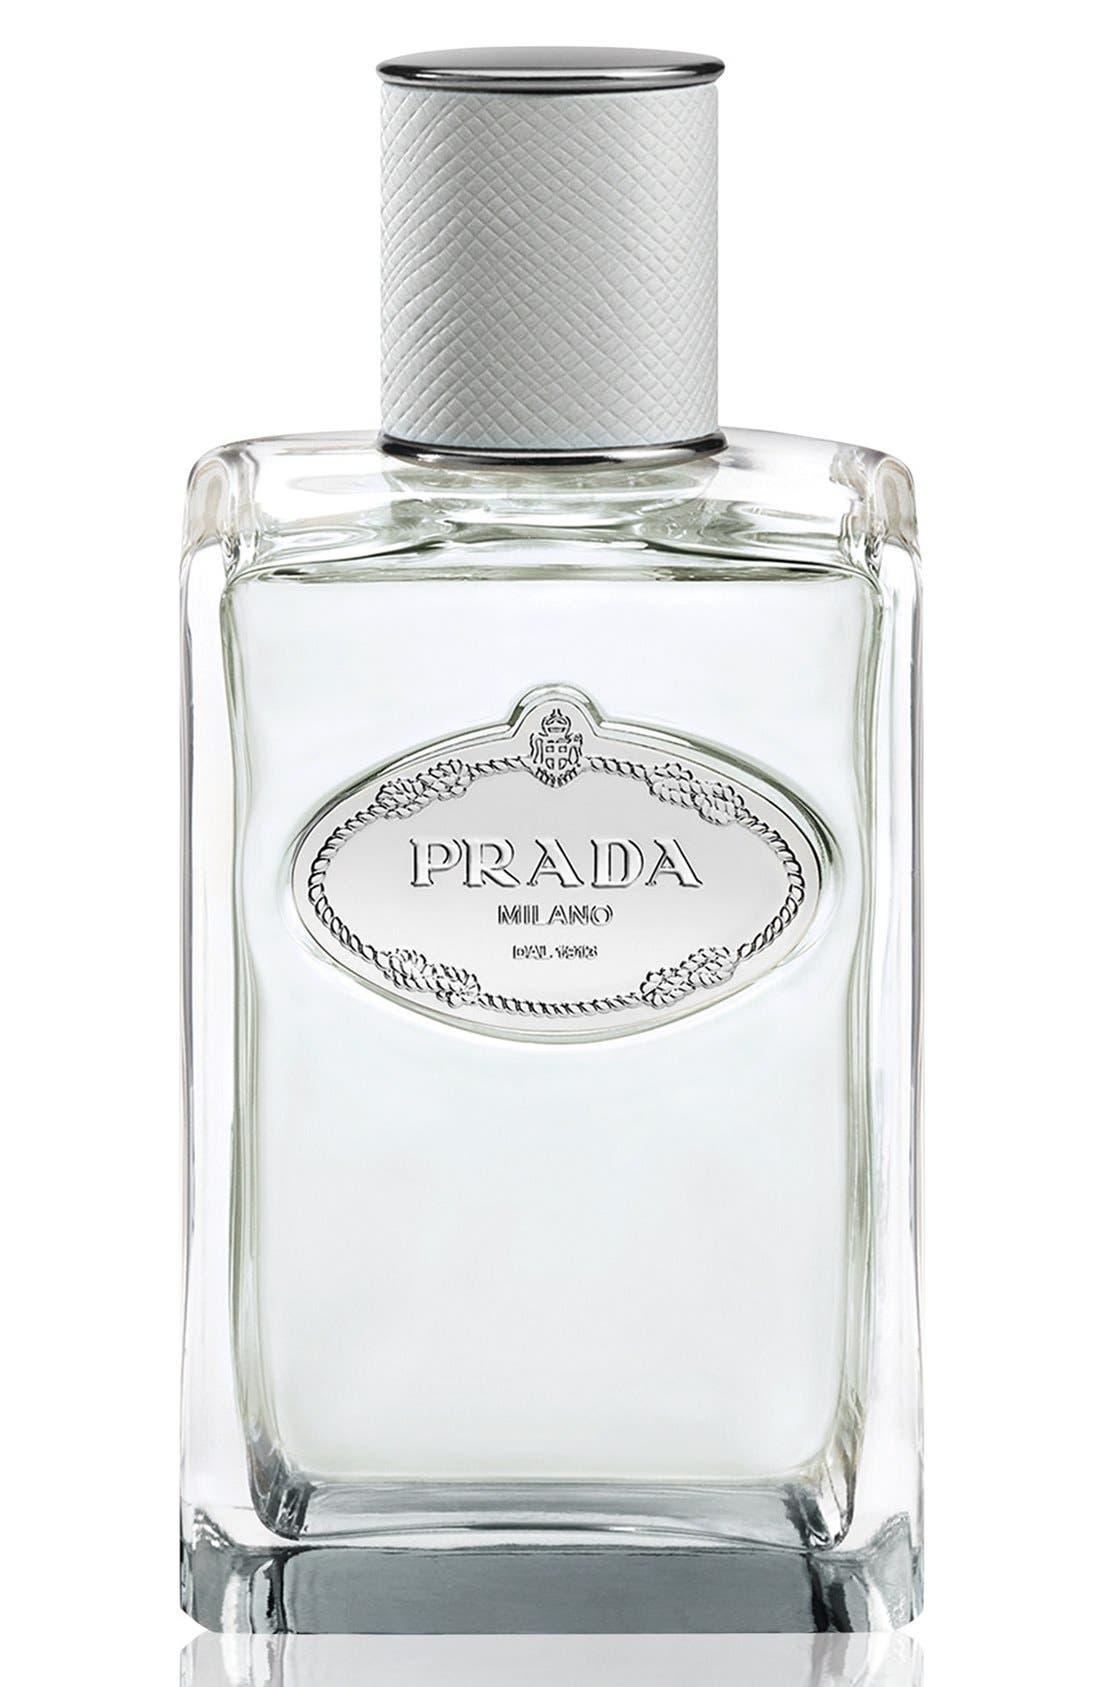 Prada Les Infusions Iris Cèdre Eau de Parfum